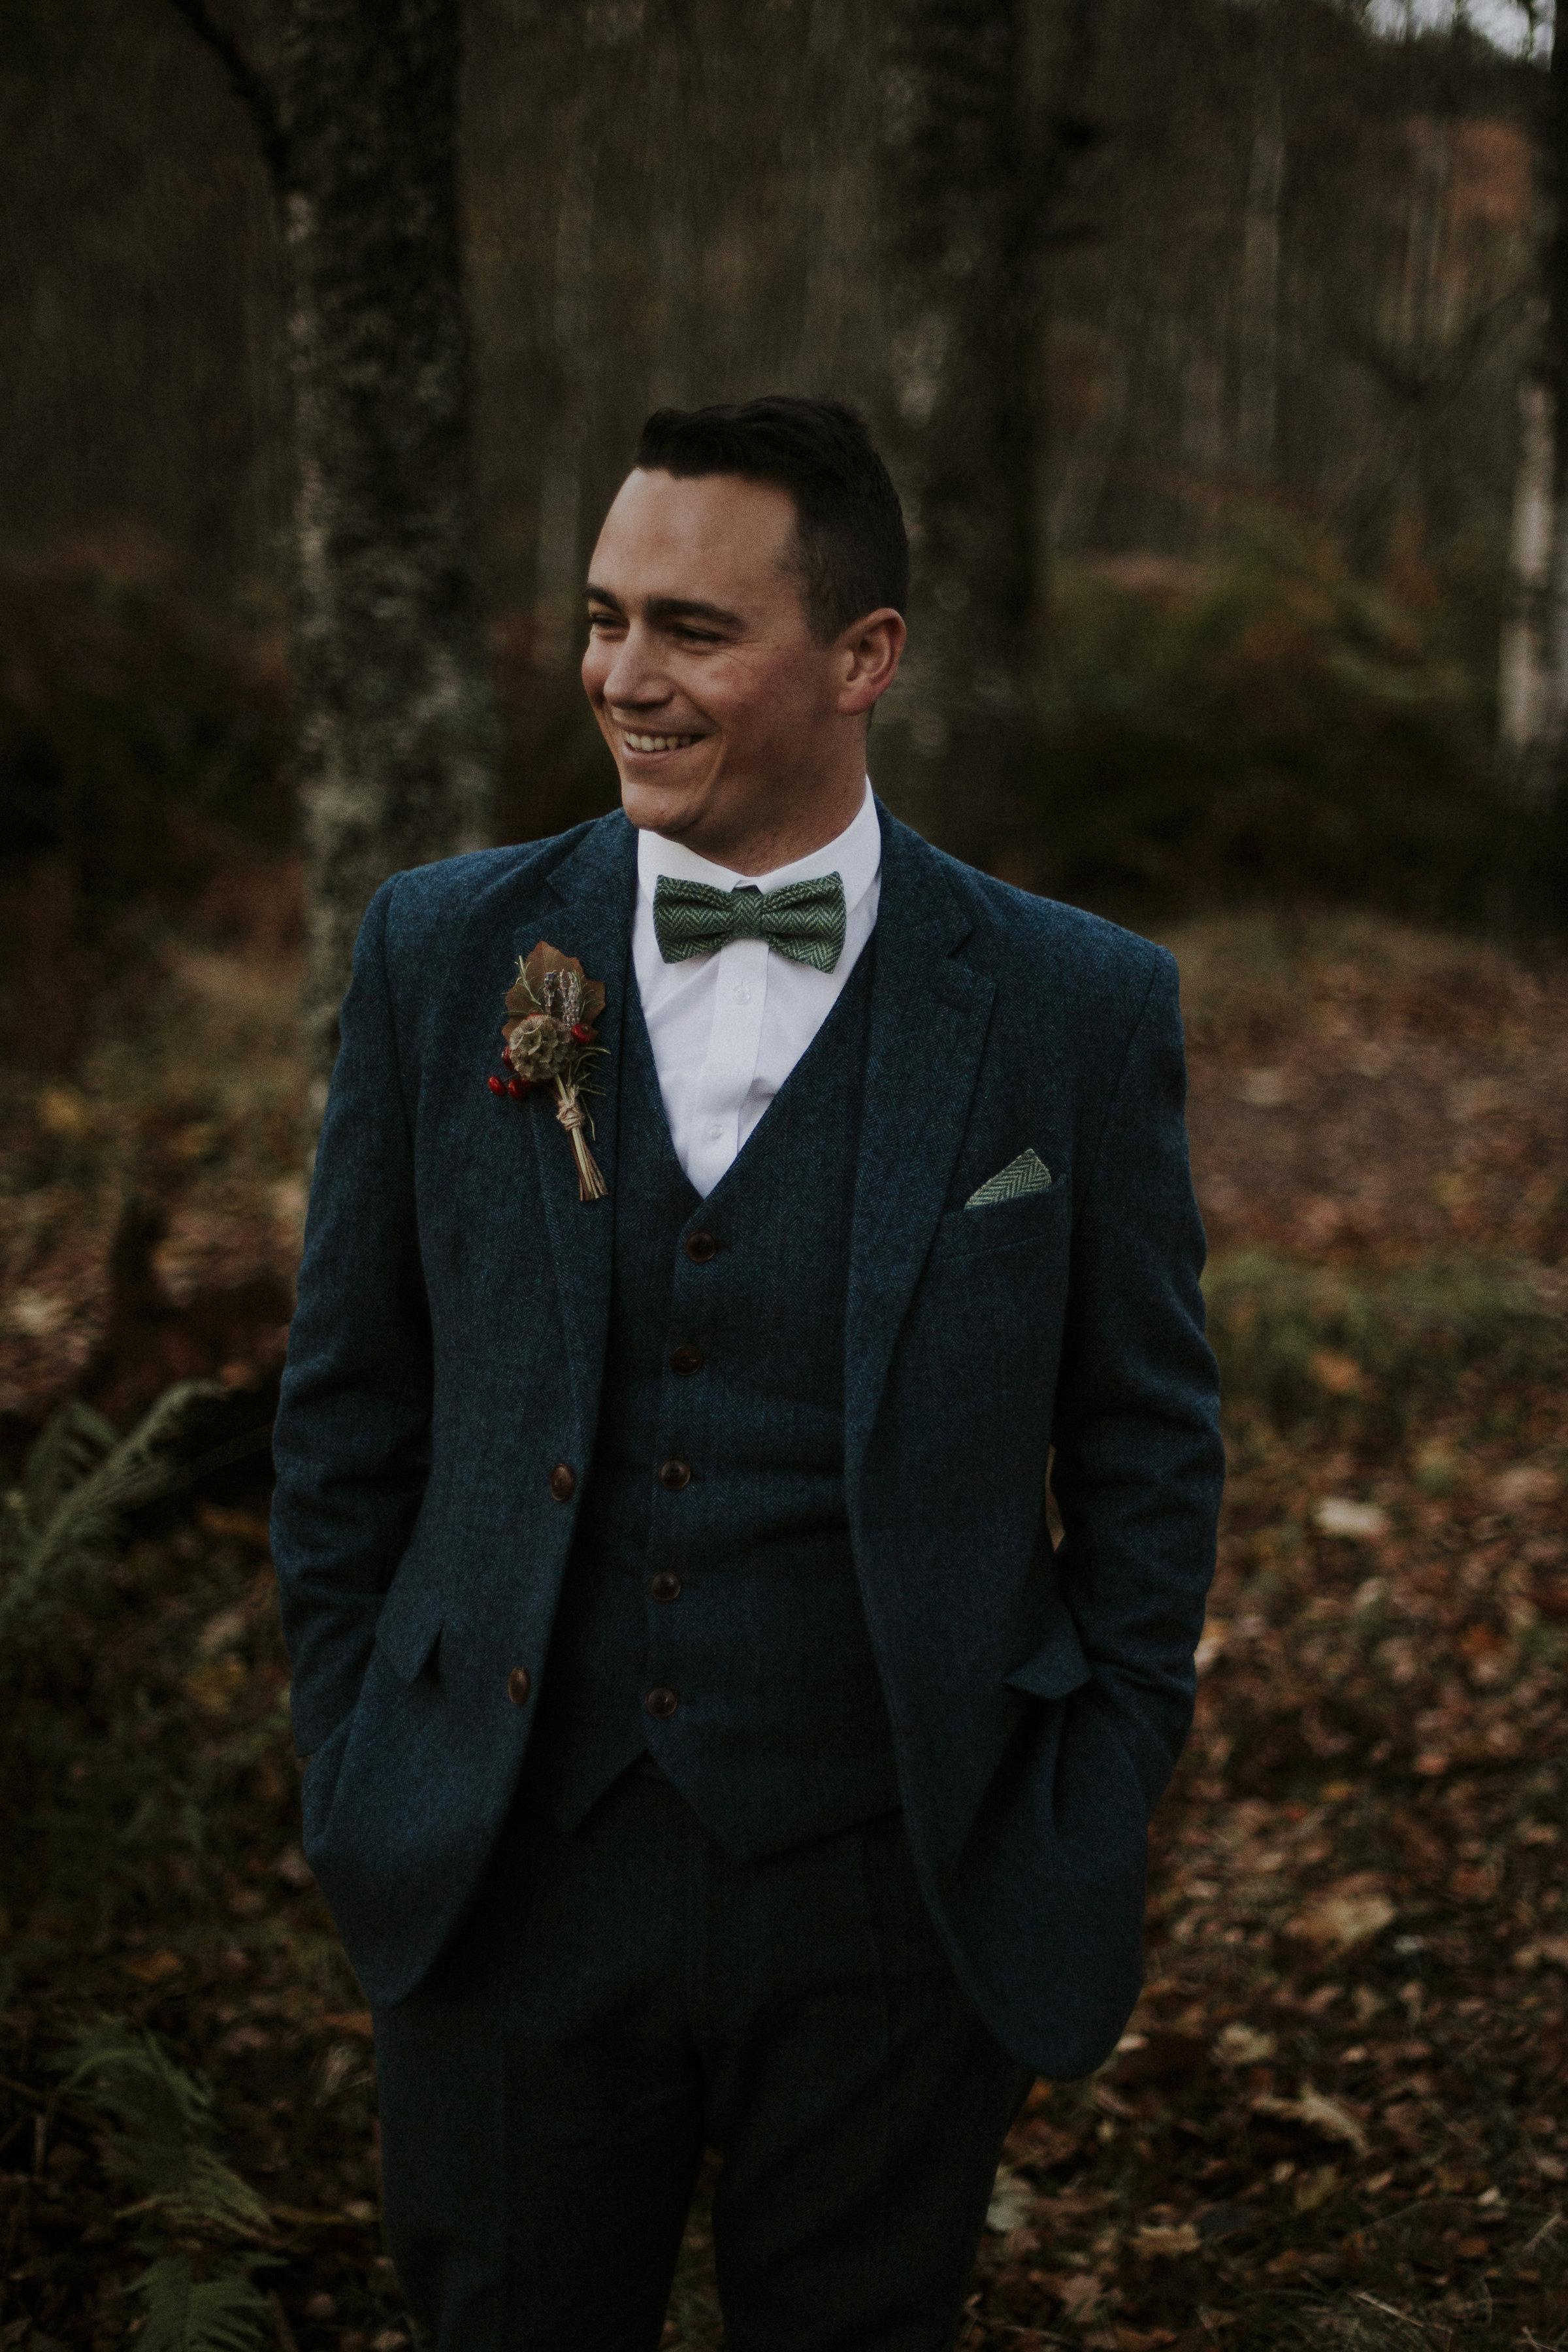 563_groom_fashion_scotland.jpg